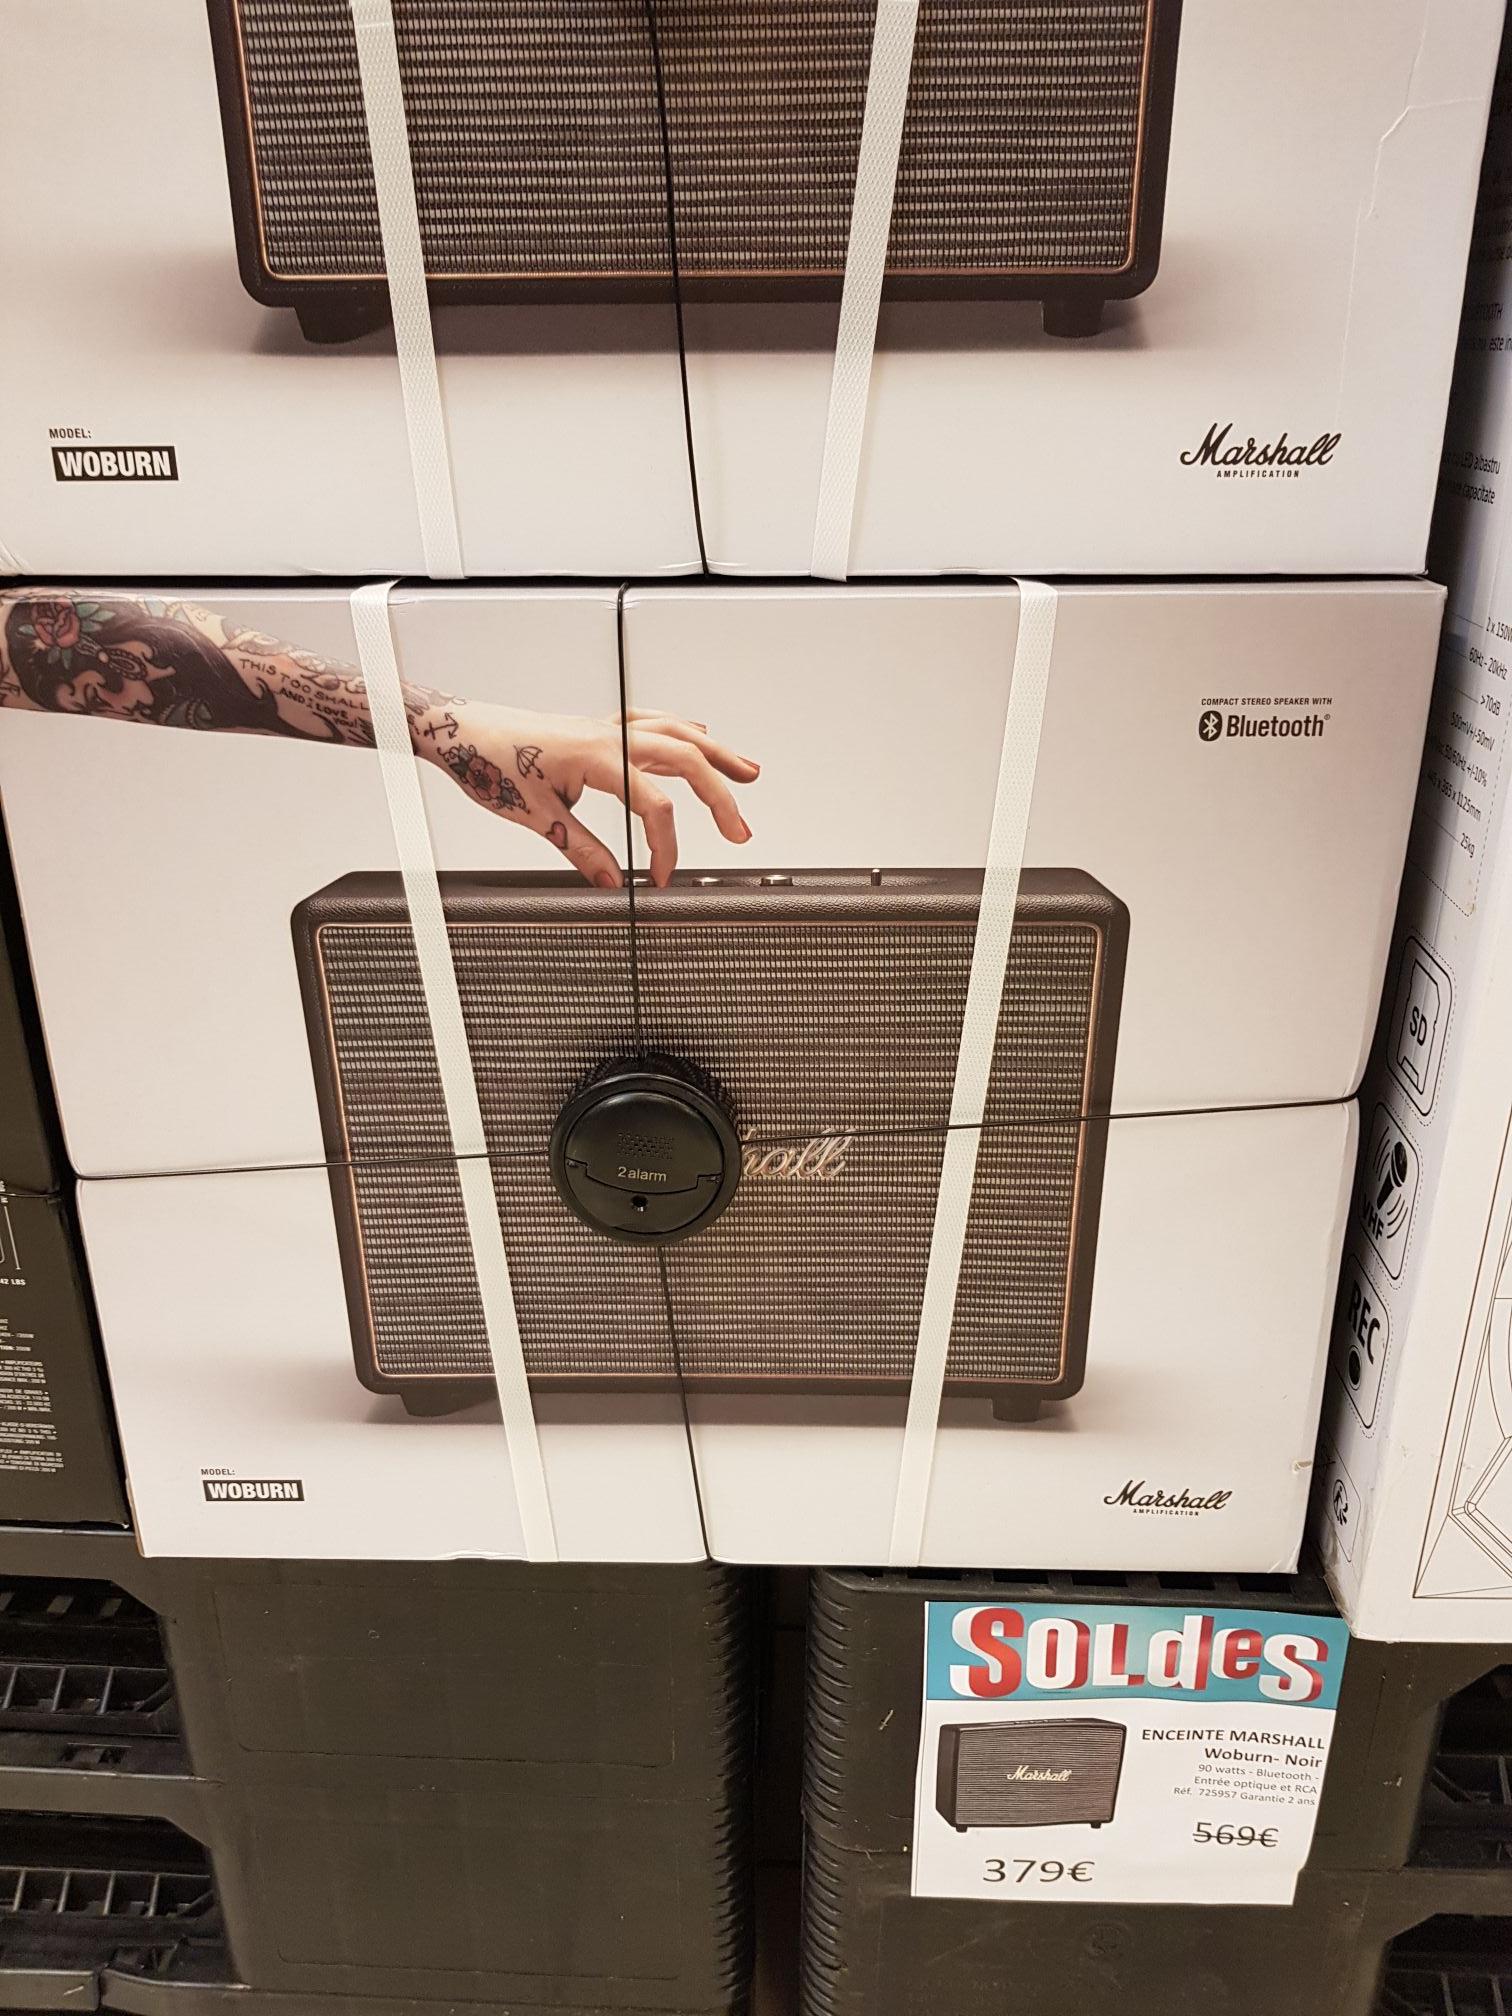 Enceinte sans fil Marshall Woburn - Bluetooth, Auchan Boissenart (77)